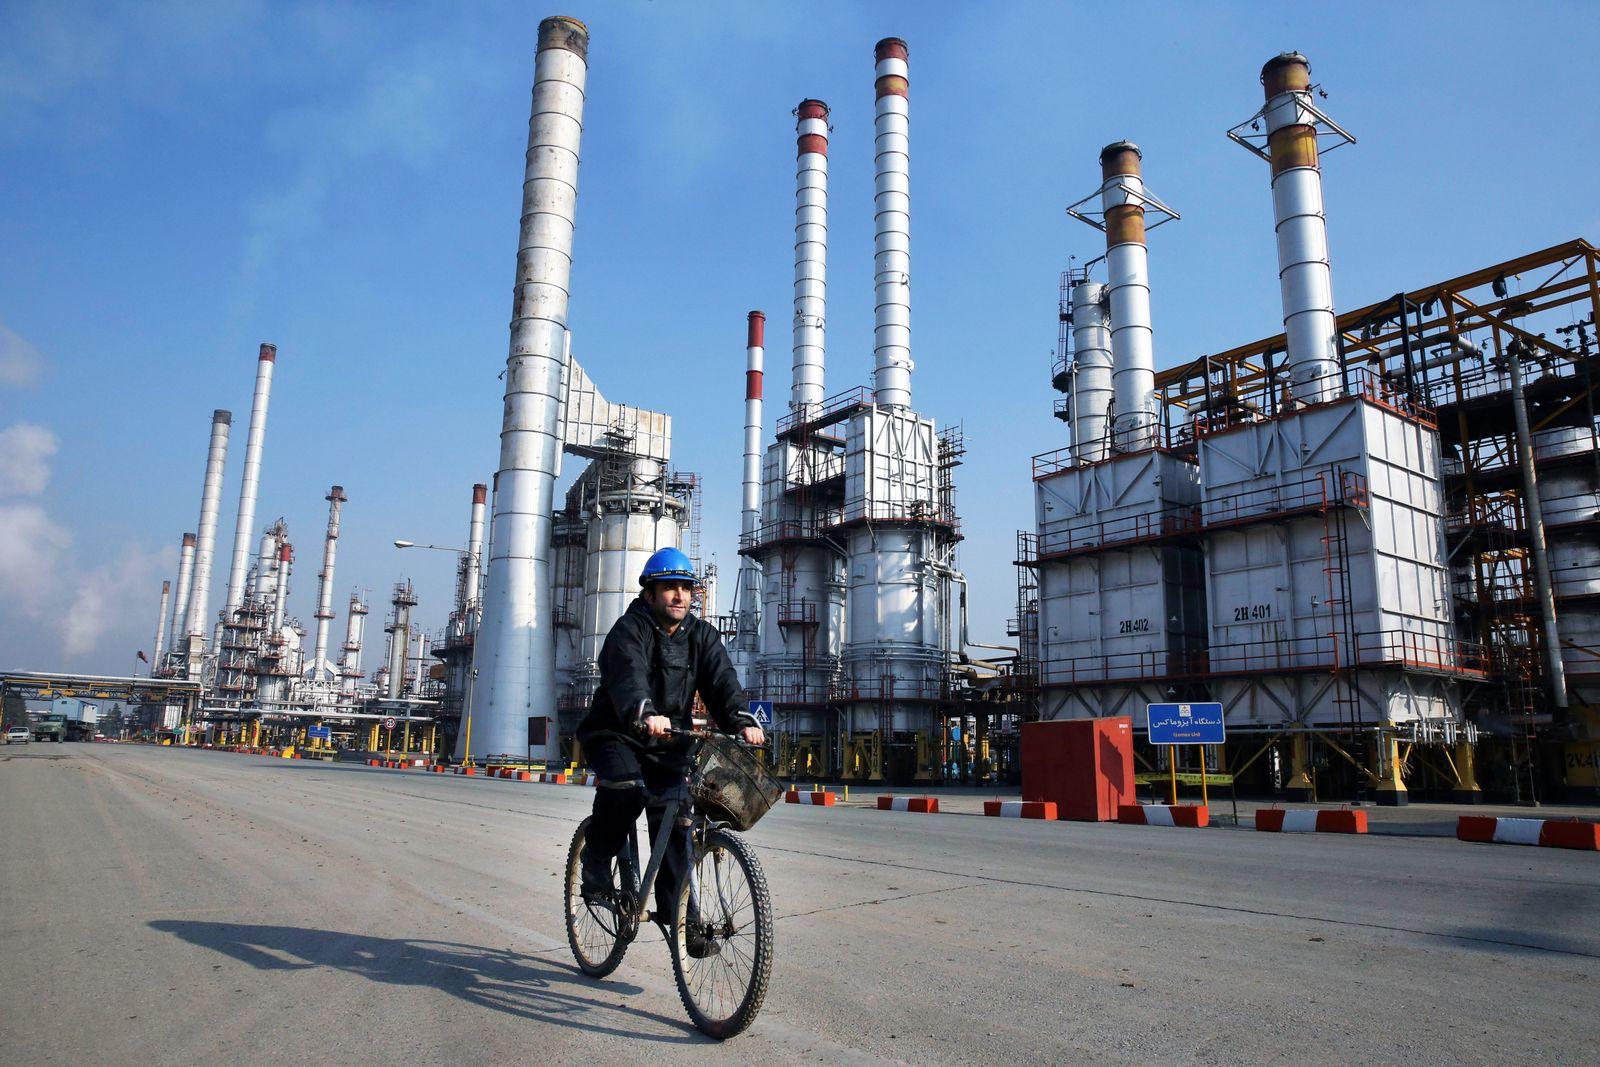 Iran / Konjuktur / Wirtschaft / Öl / Ölindustrie